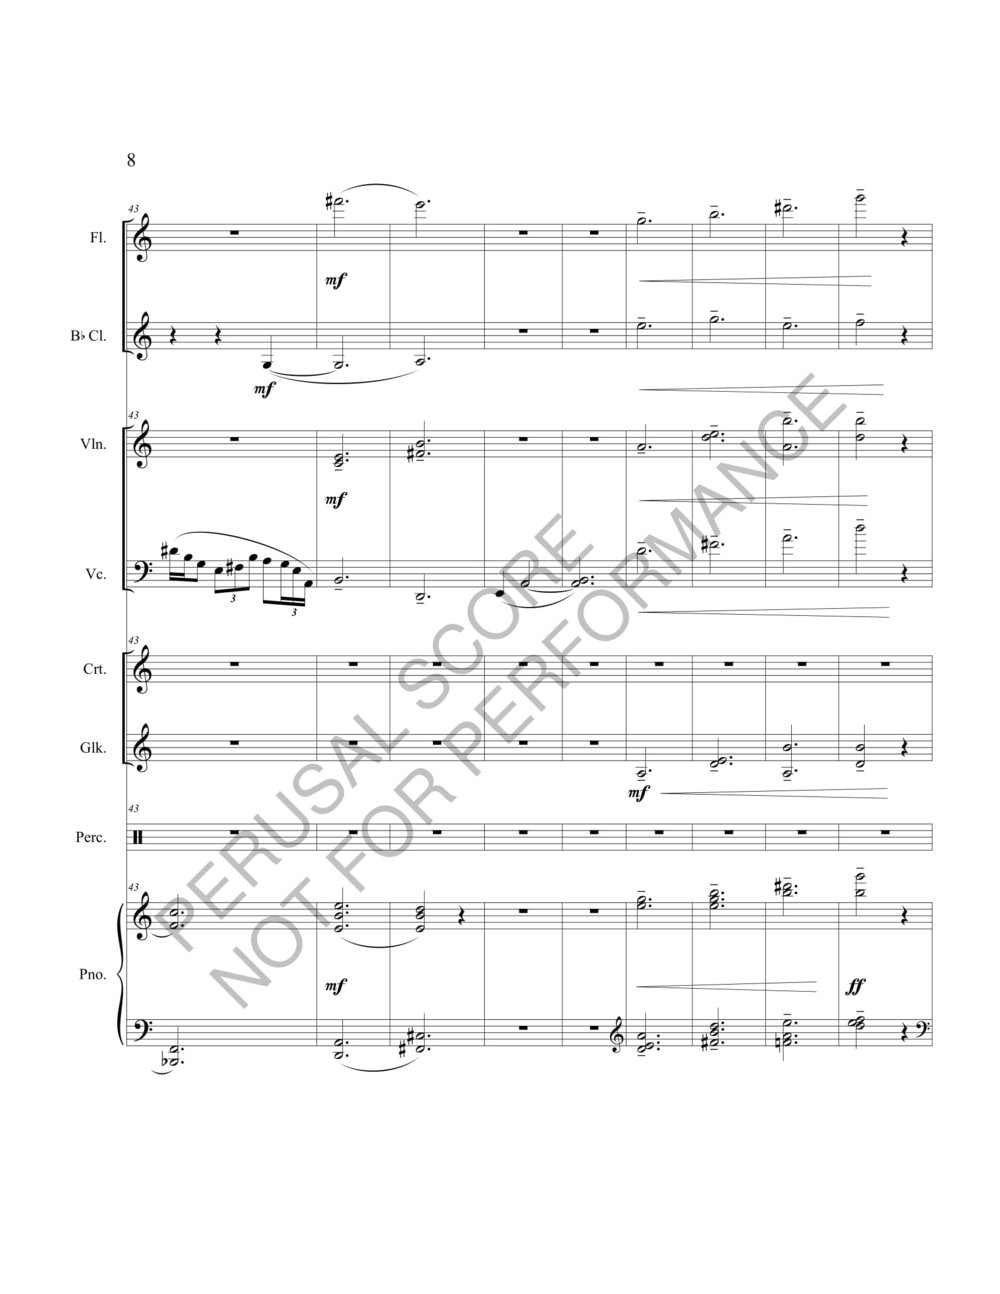 Boyd Terra Liberi Score-watermark-14.jpg